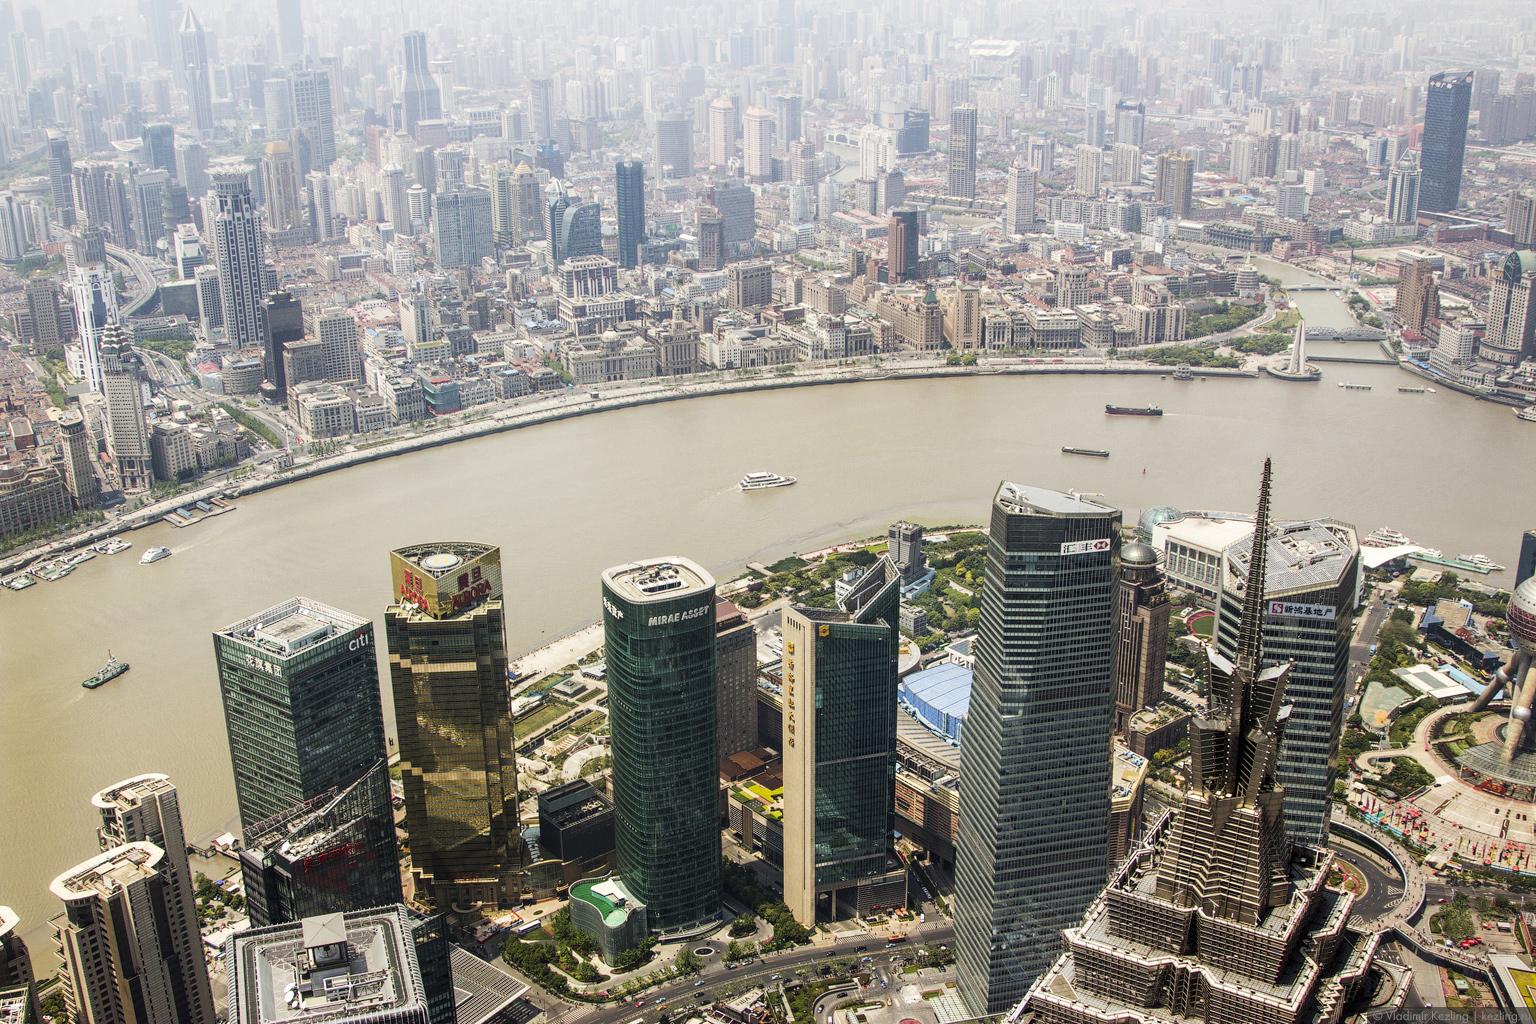 Китай. Шанхай. Утро на небесах